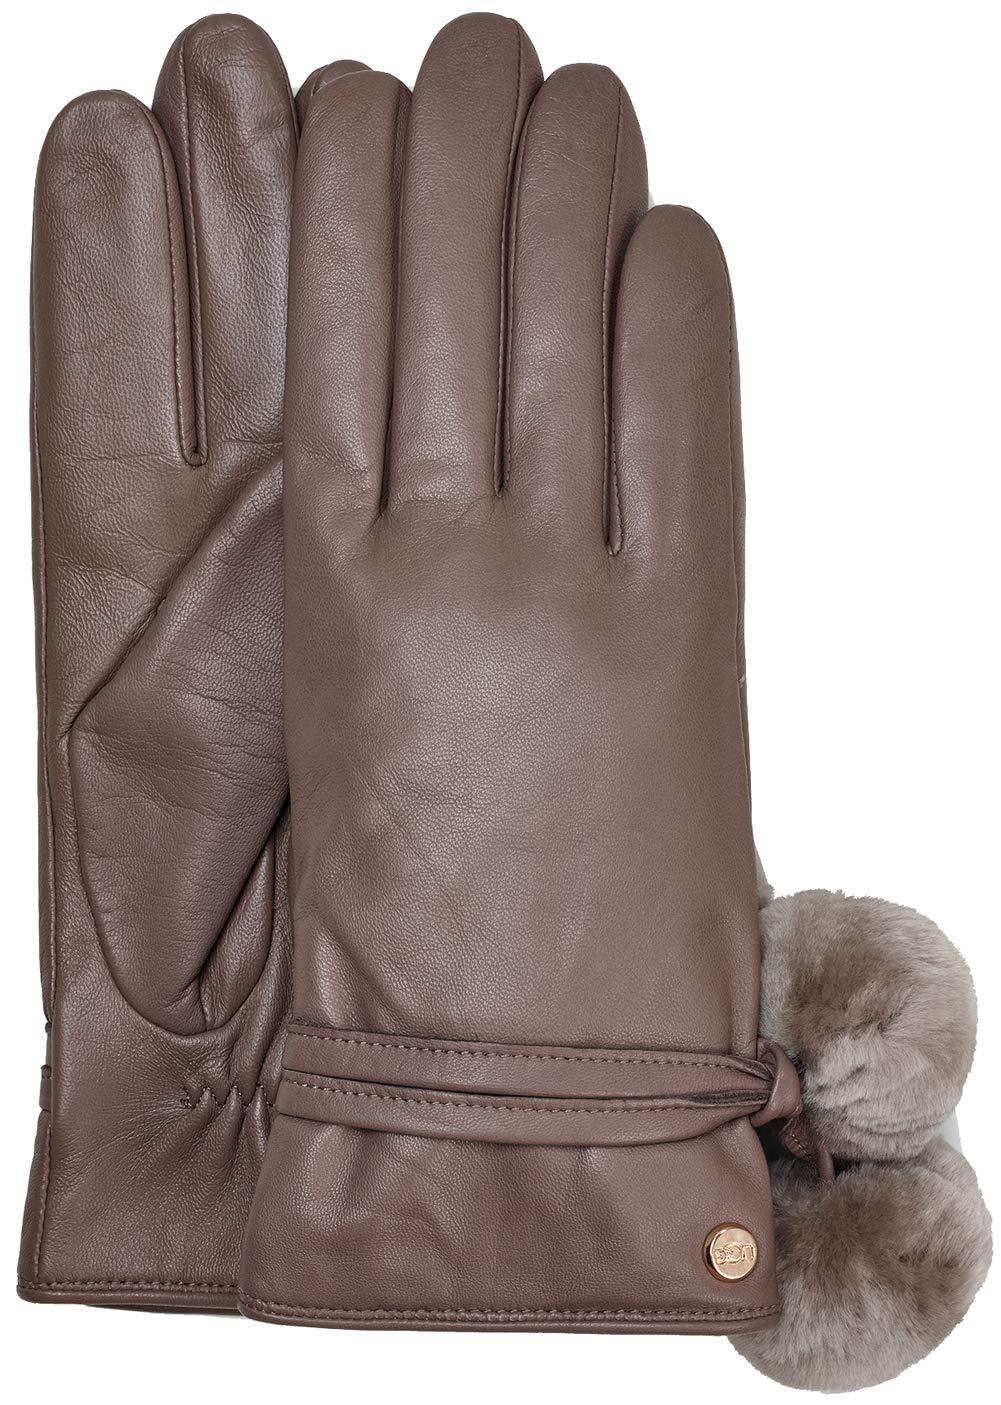 UGG Womens Leather Pom Glove, Storm Grey, Size Small by UGG